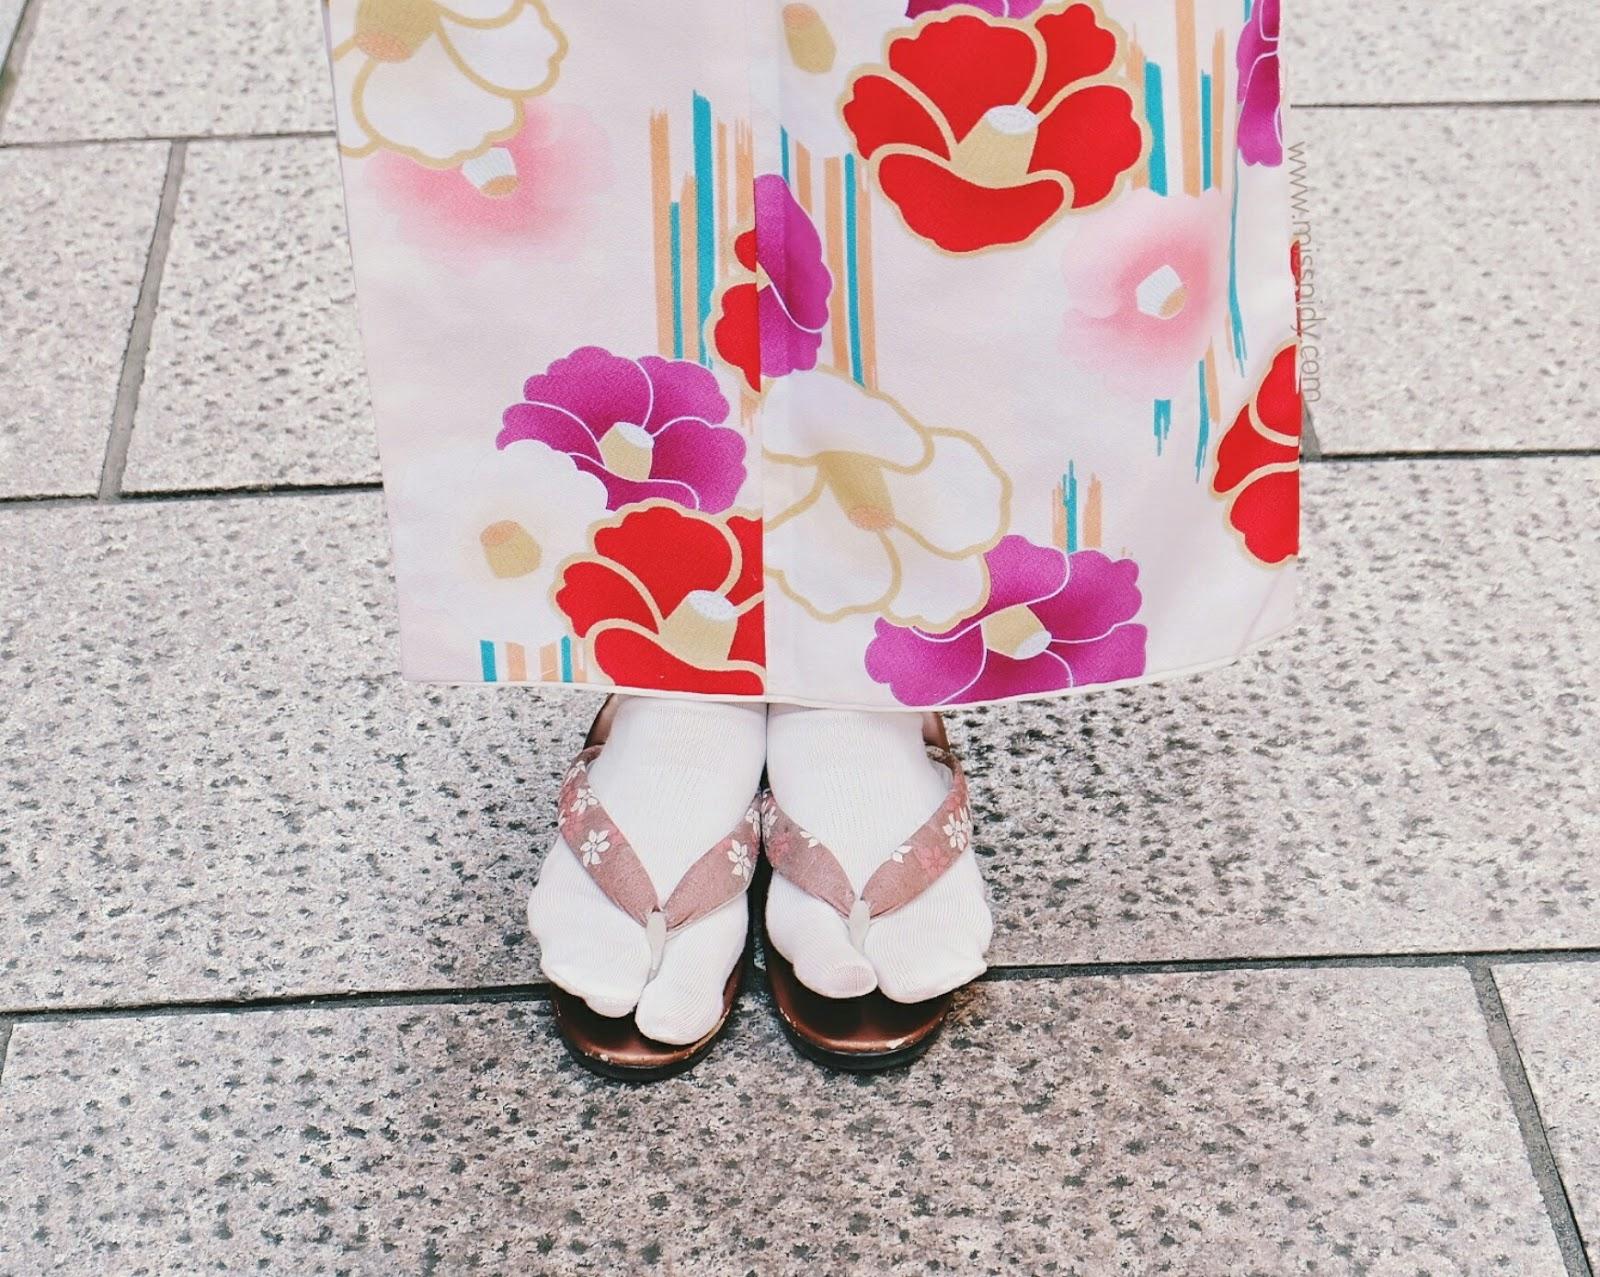 pengalaman rental kimono di jepang